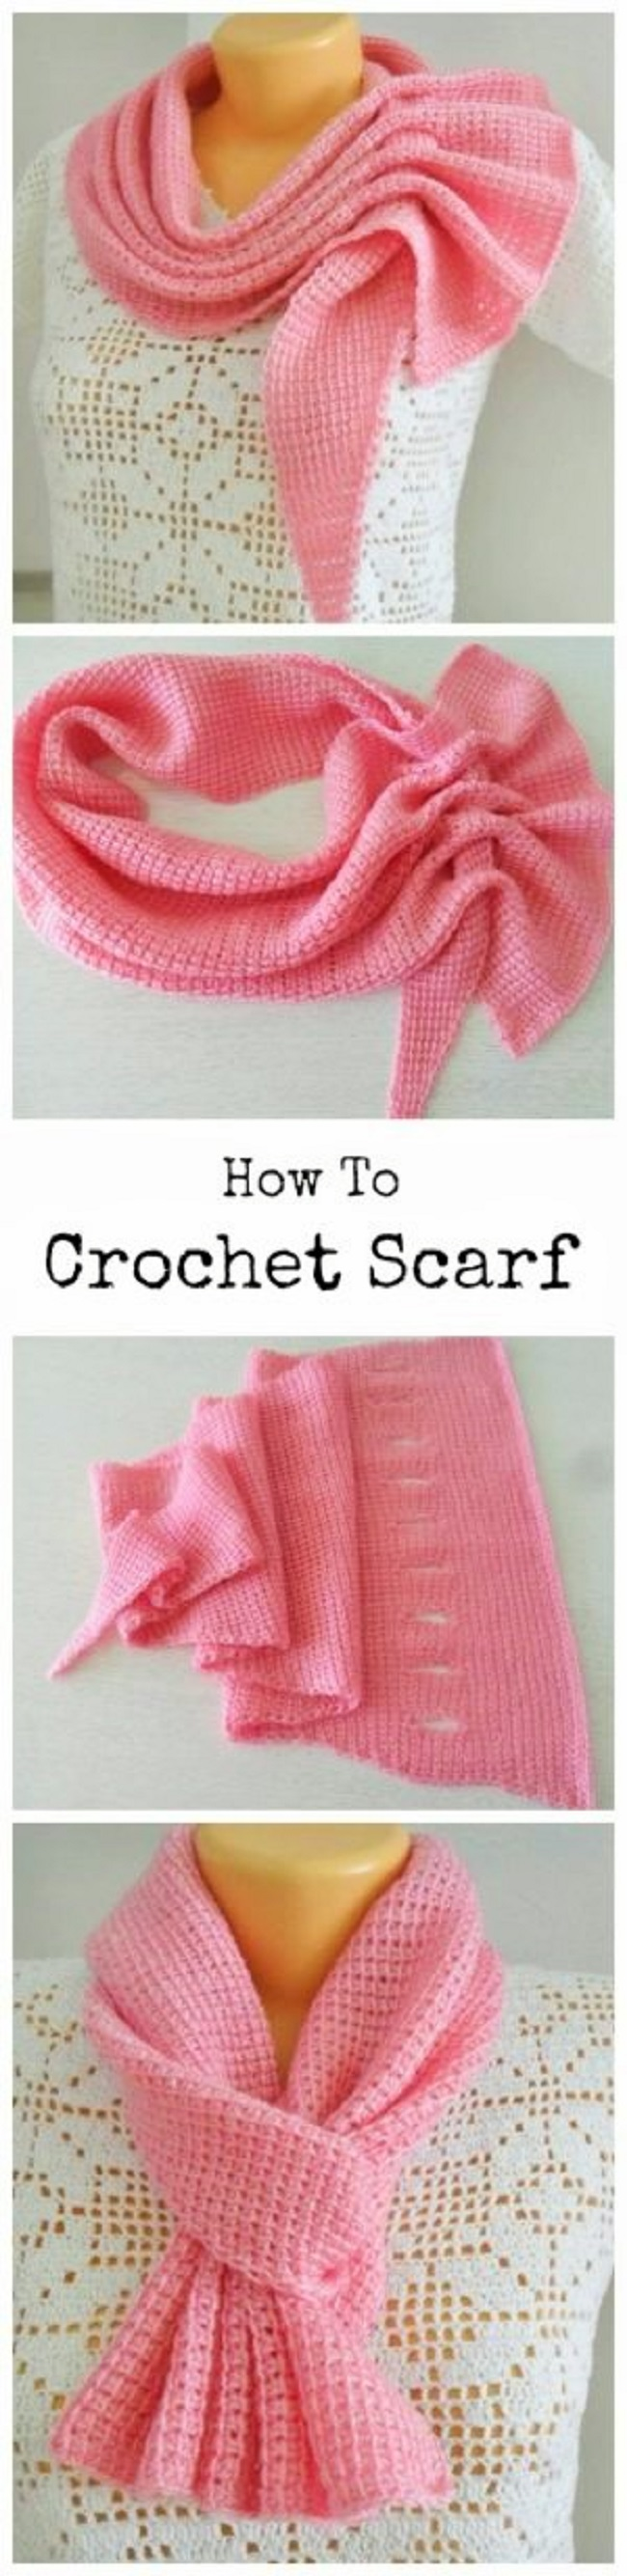 Home made Diy crochet Ideas-17